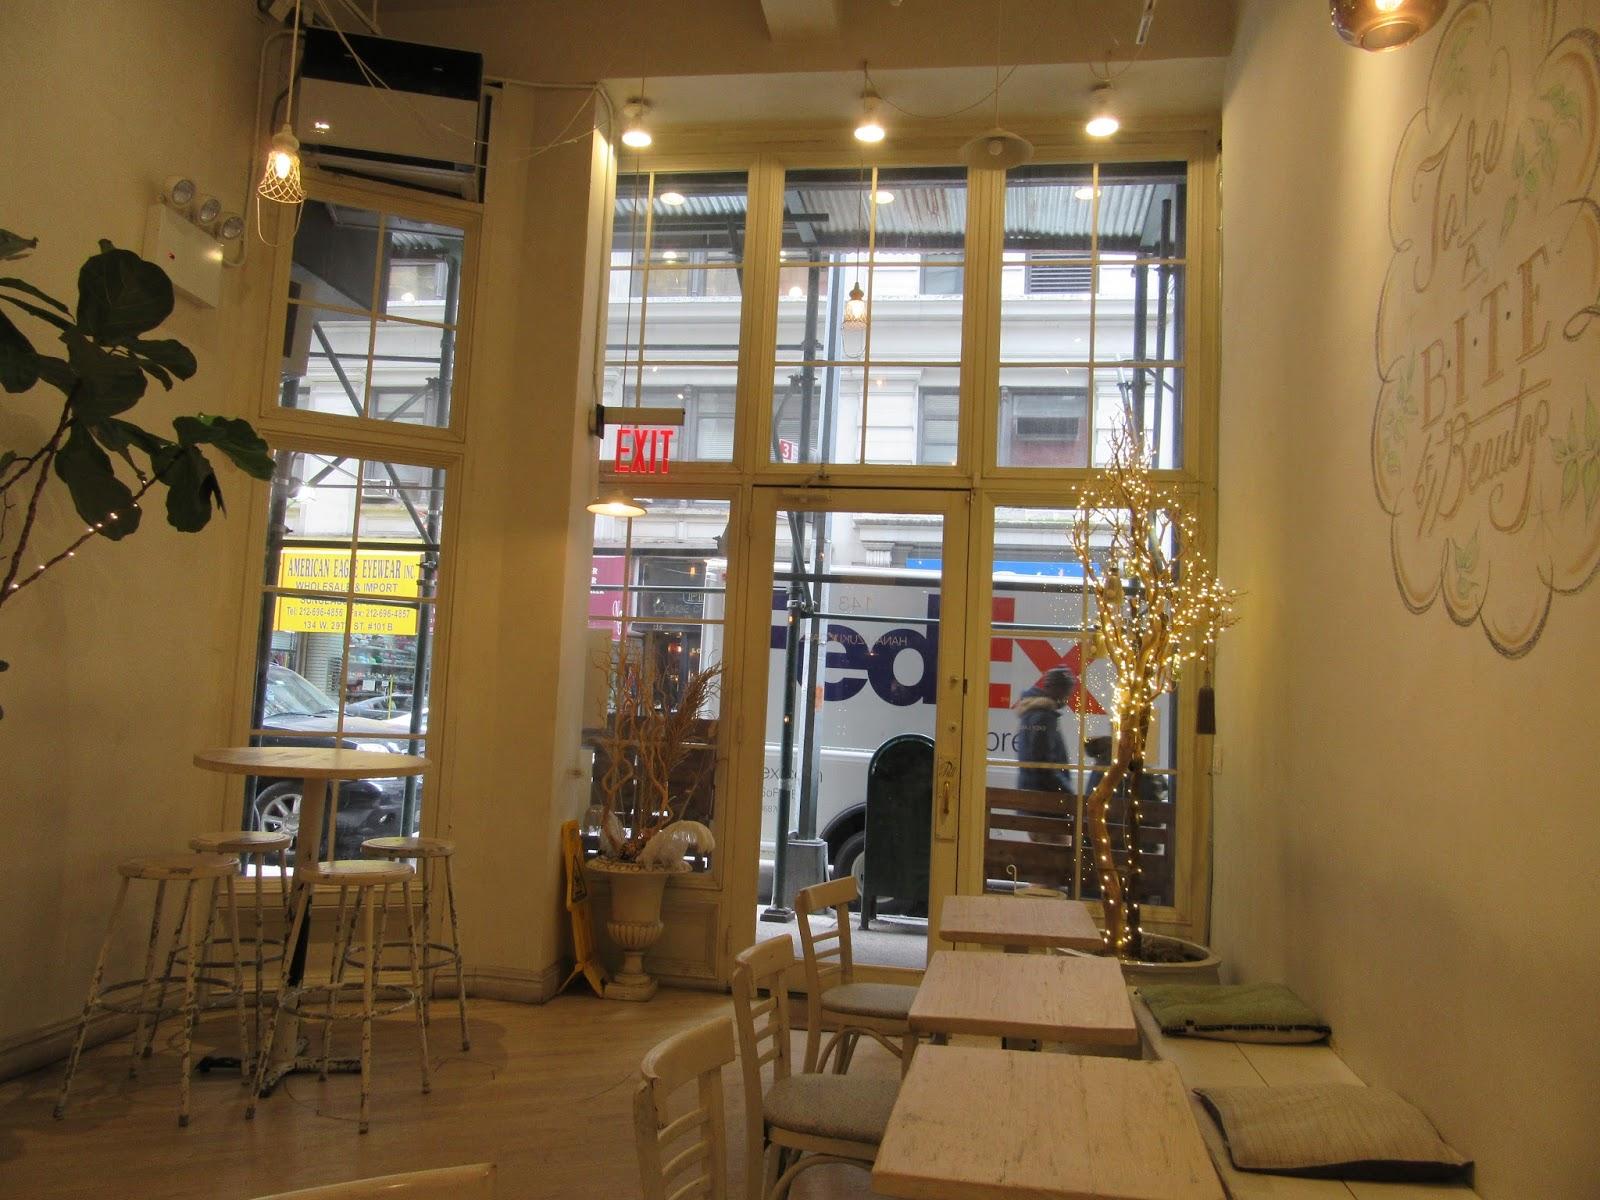 i love new york!: 日本のカフェ文化、nyを制す! 超かわいい女子カフェ